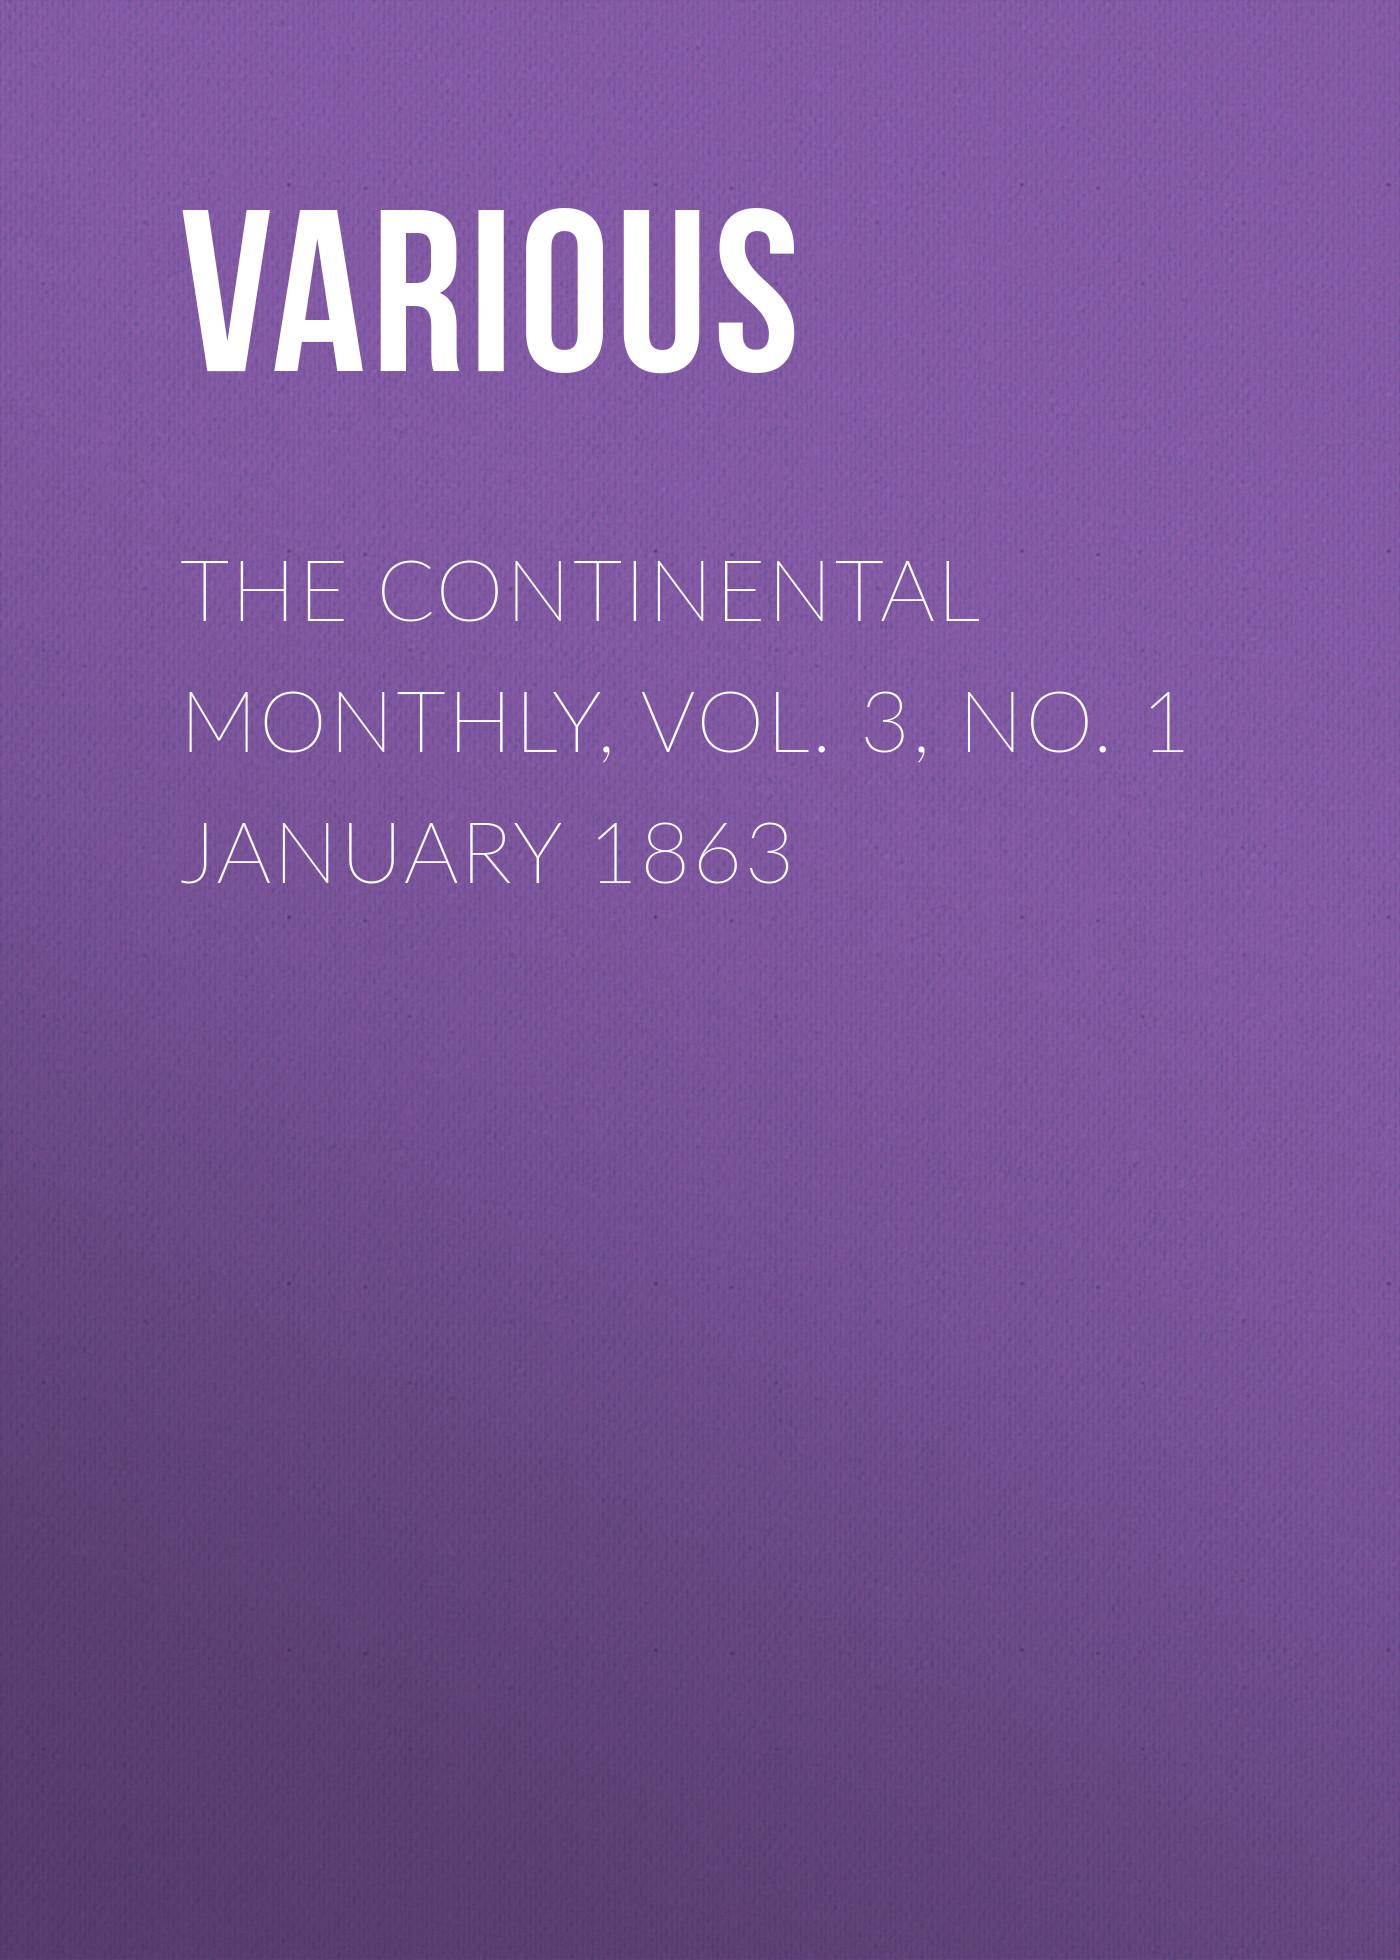 Various The Continental Monthly, Vol. 3, No. 1 January 1863 batman no man s land vol 3